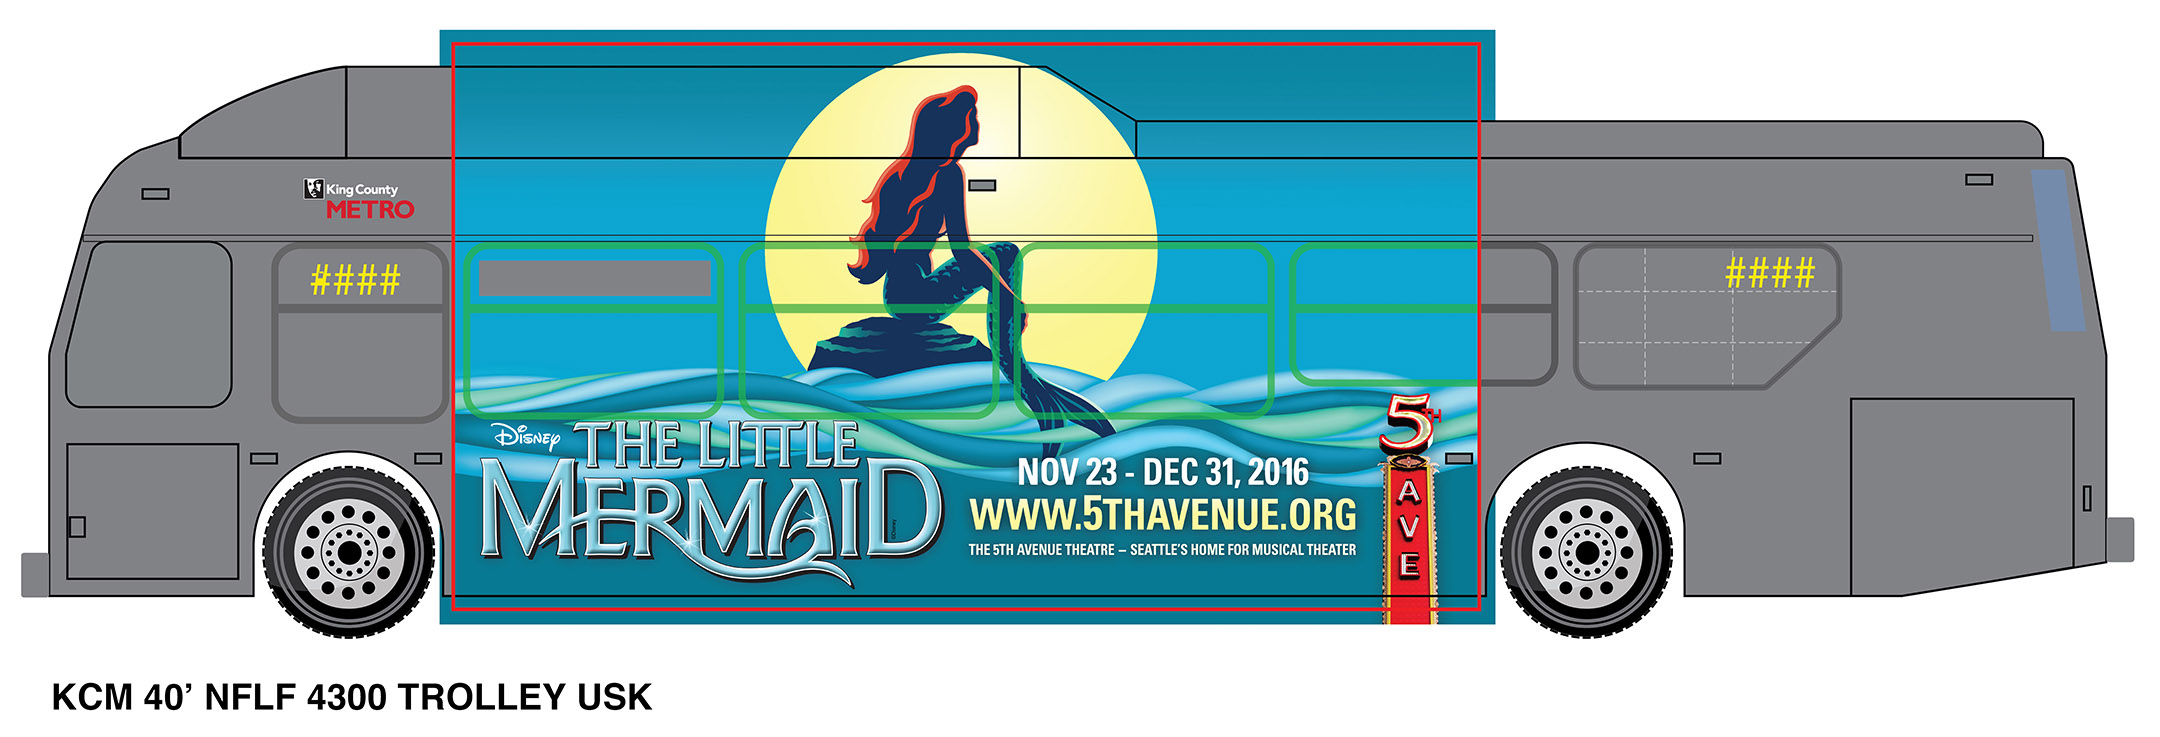 The Little Mermaid  - Ultra Super King Bus Wraps